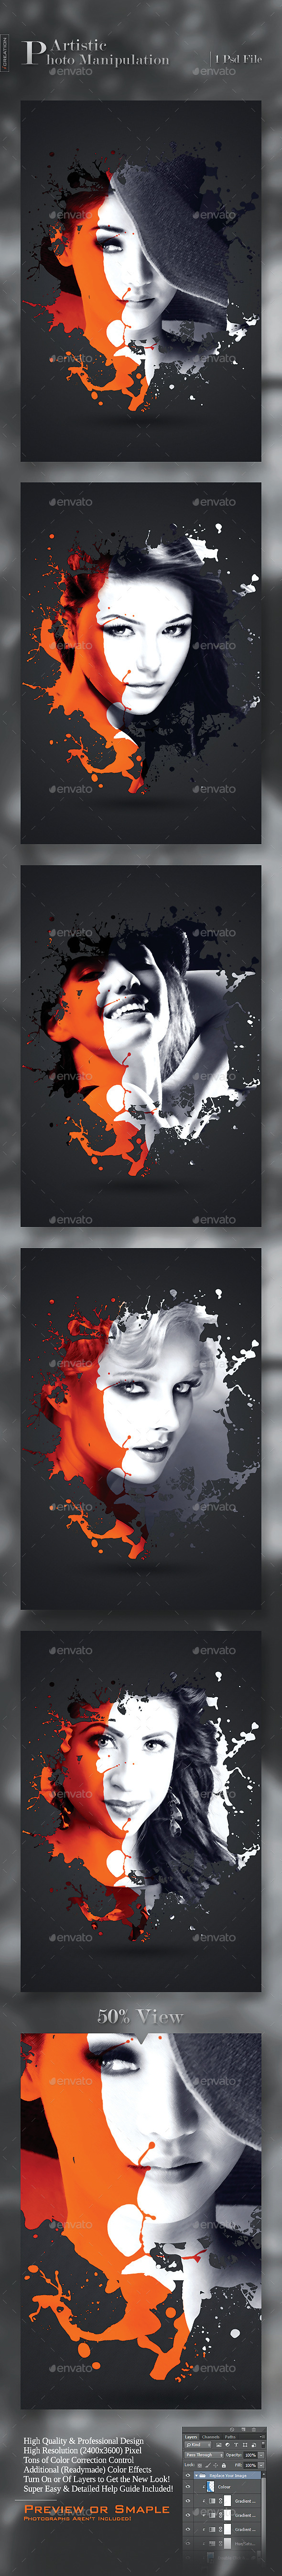 Artistic Photo Manipulation - Photo Templates Graphics